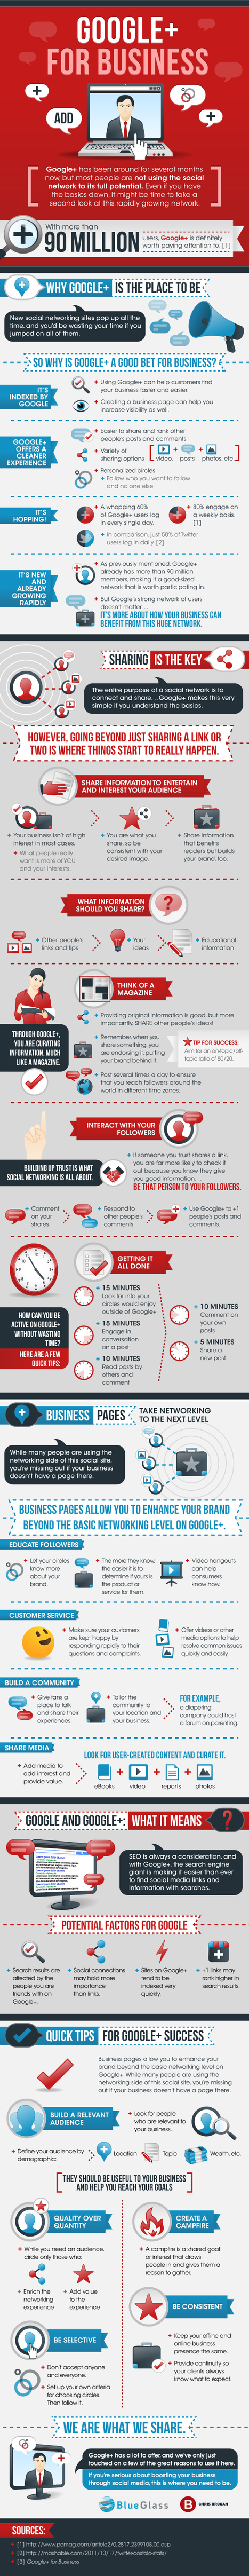 43 Google Plus Small Business Marketing Tips and Tricks | Marketing Internet News | Scoop.it